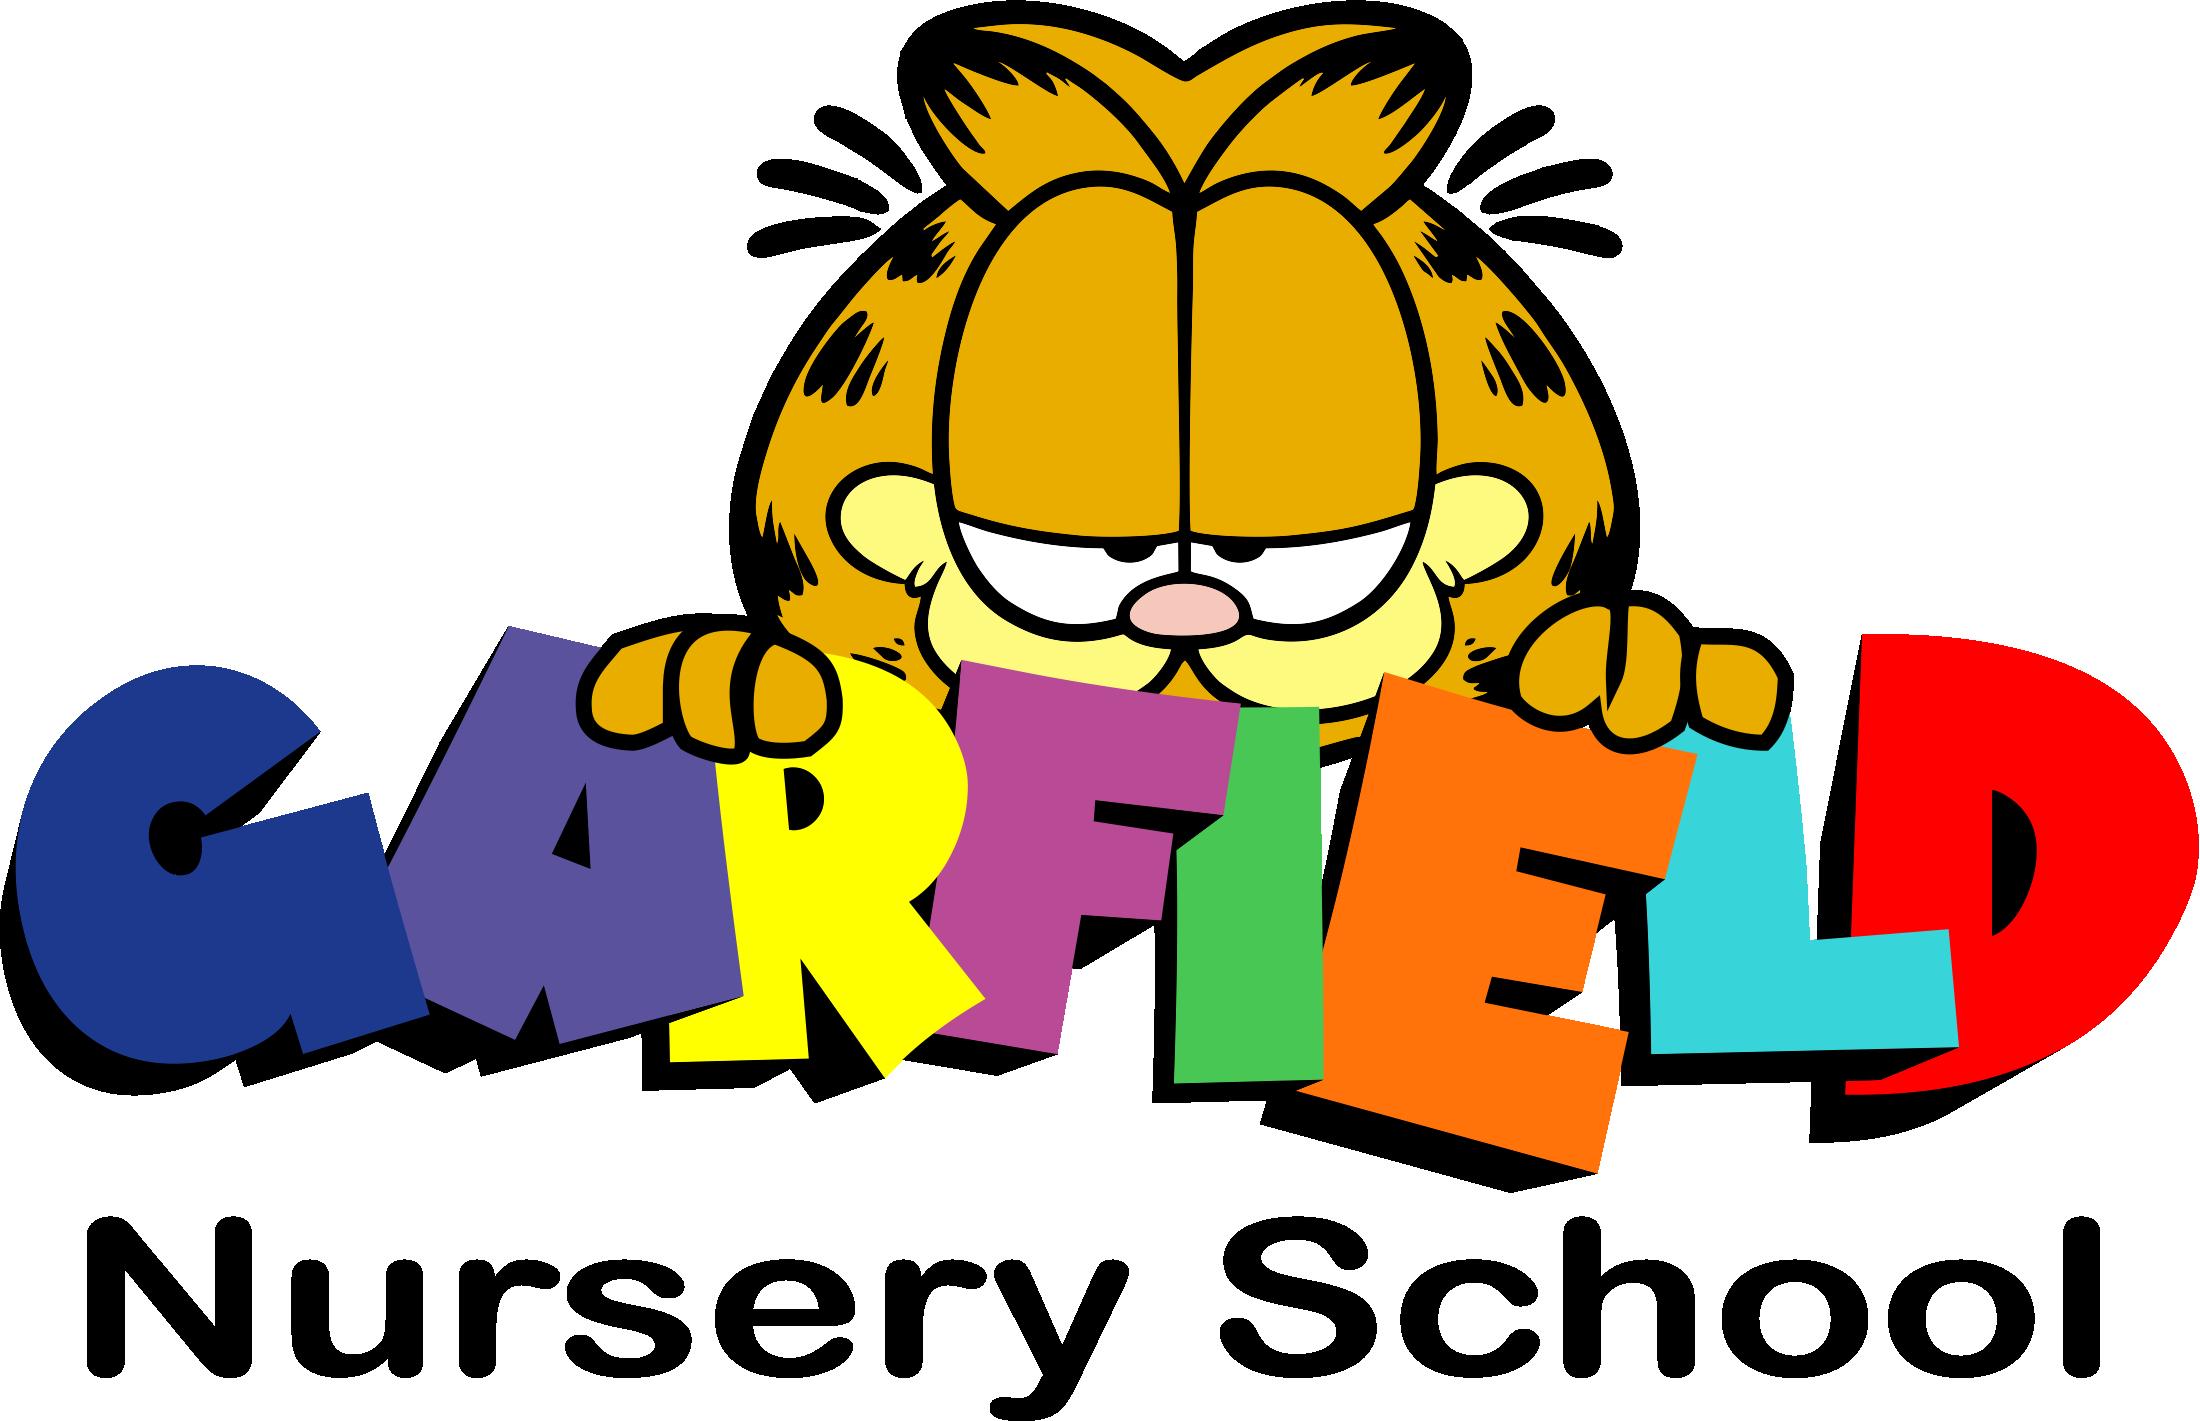 Download Garfield Logo Png Full Size Png Image Pngkit